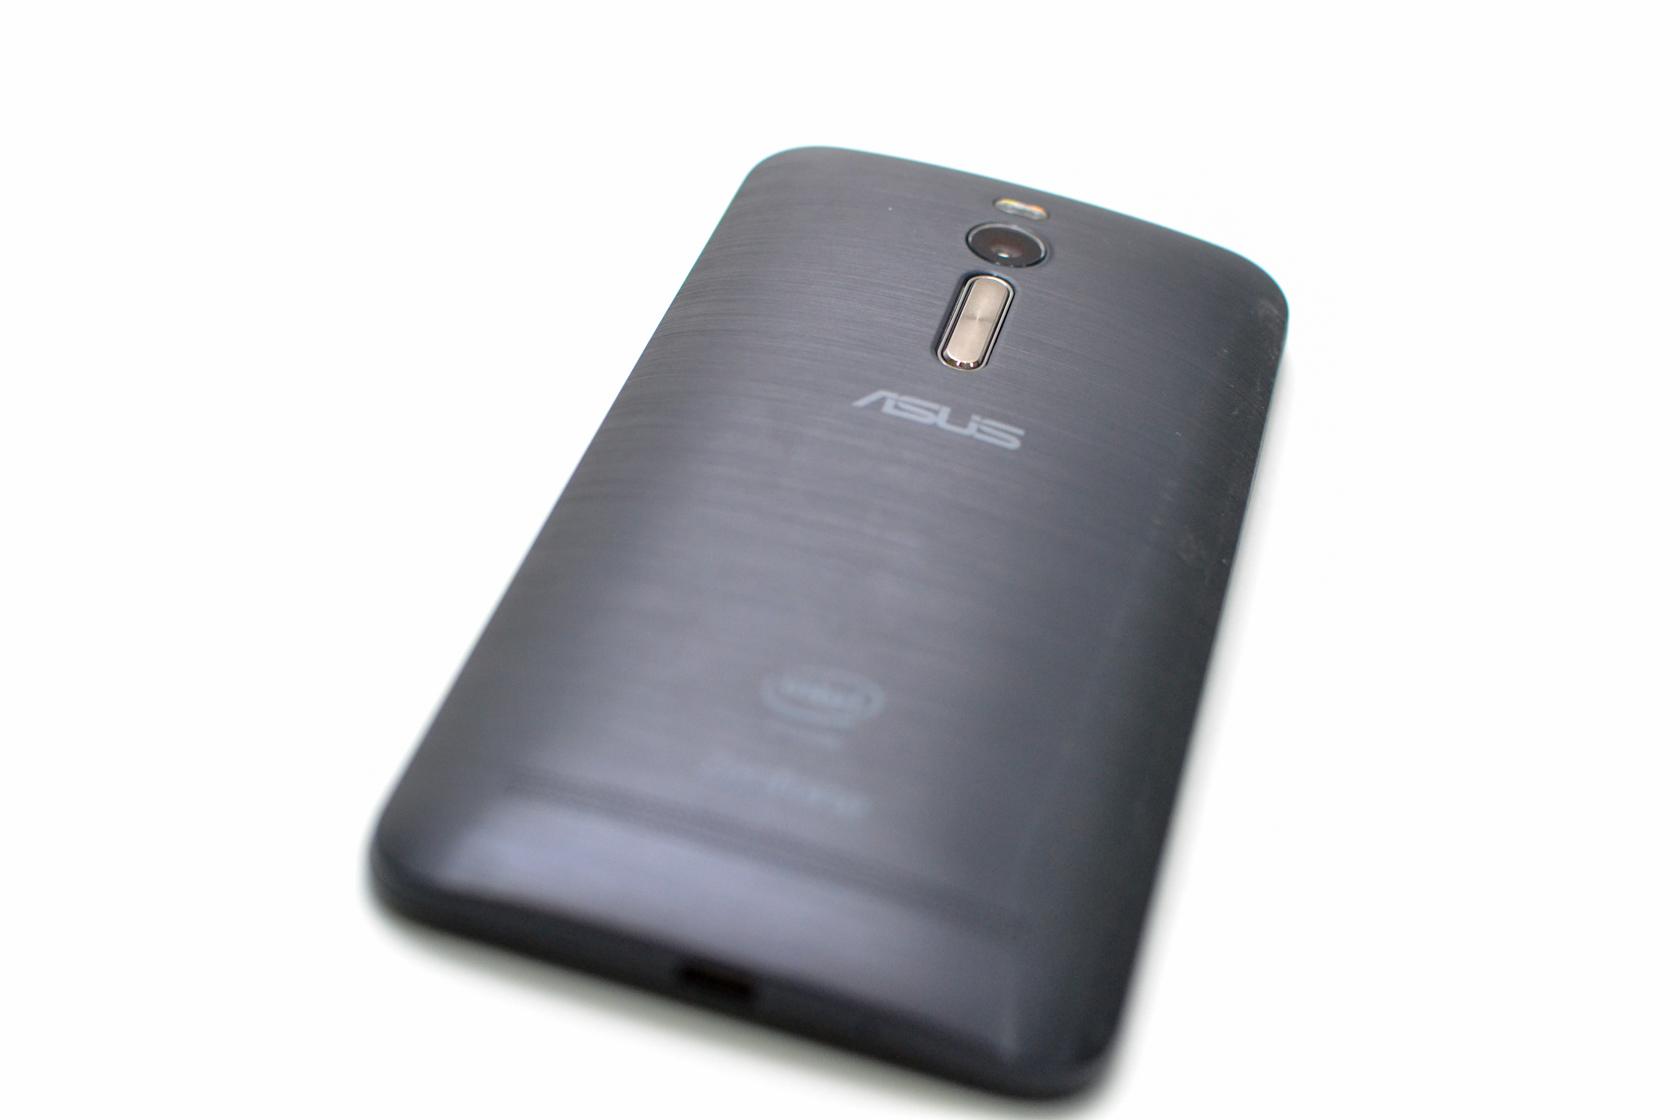 Zenfone 2-11